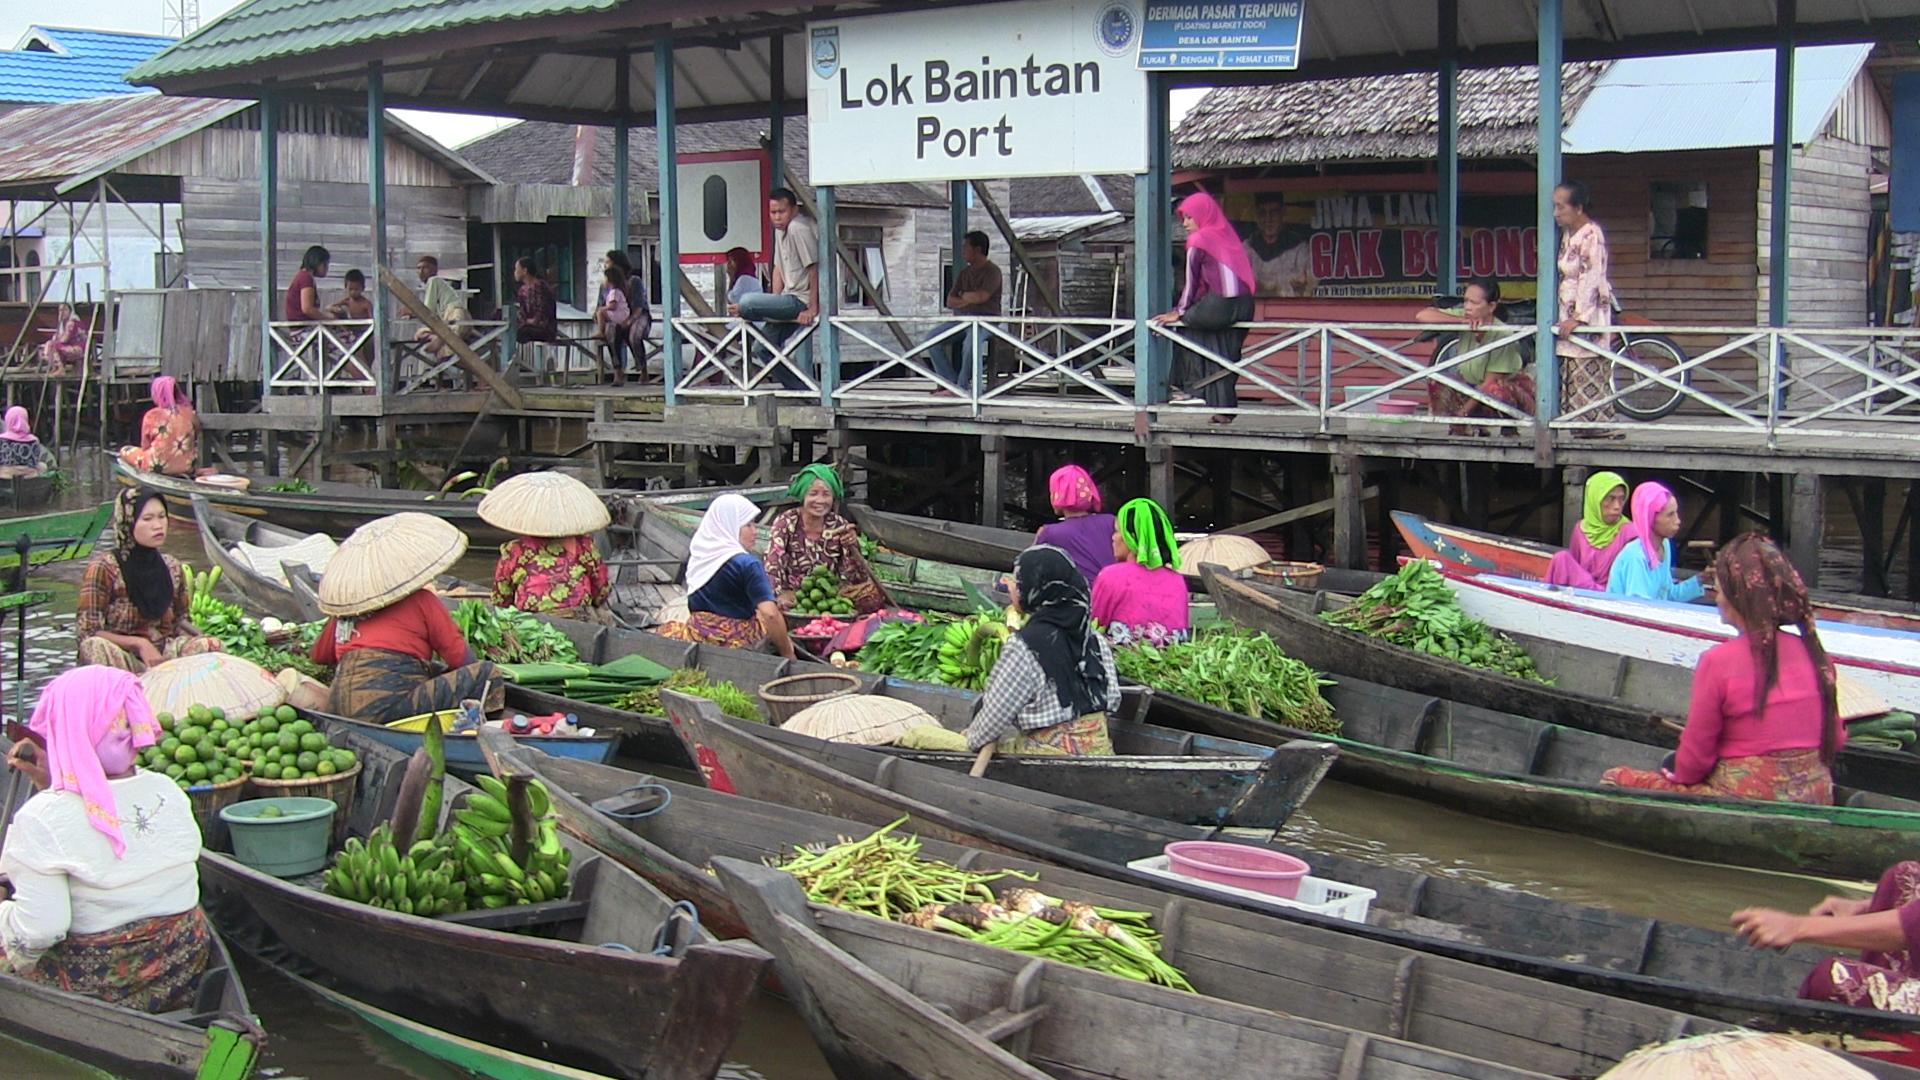 File Floating Market Lok Baintan Port Jpg Wikimedia Pasar Terapung